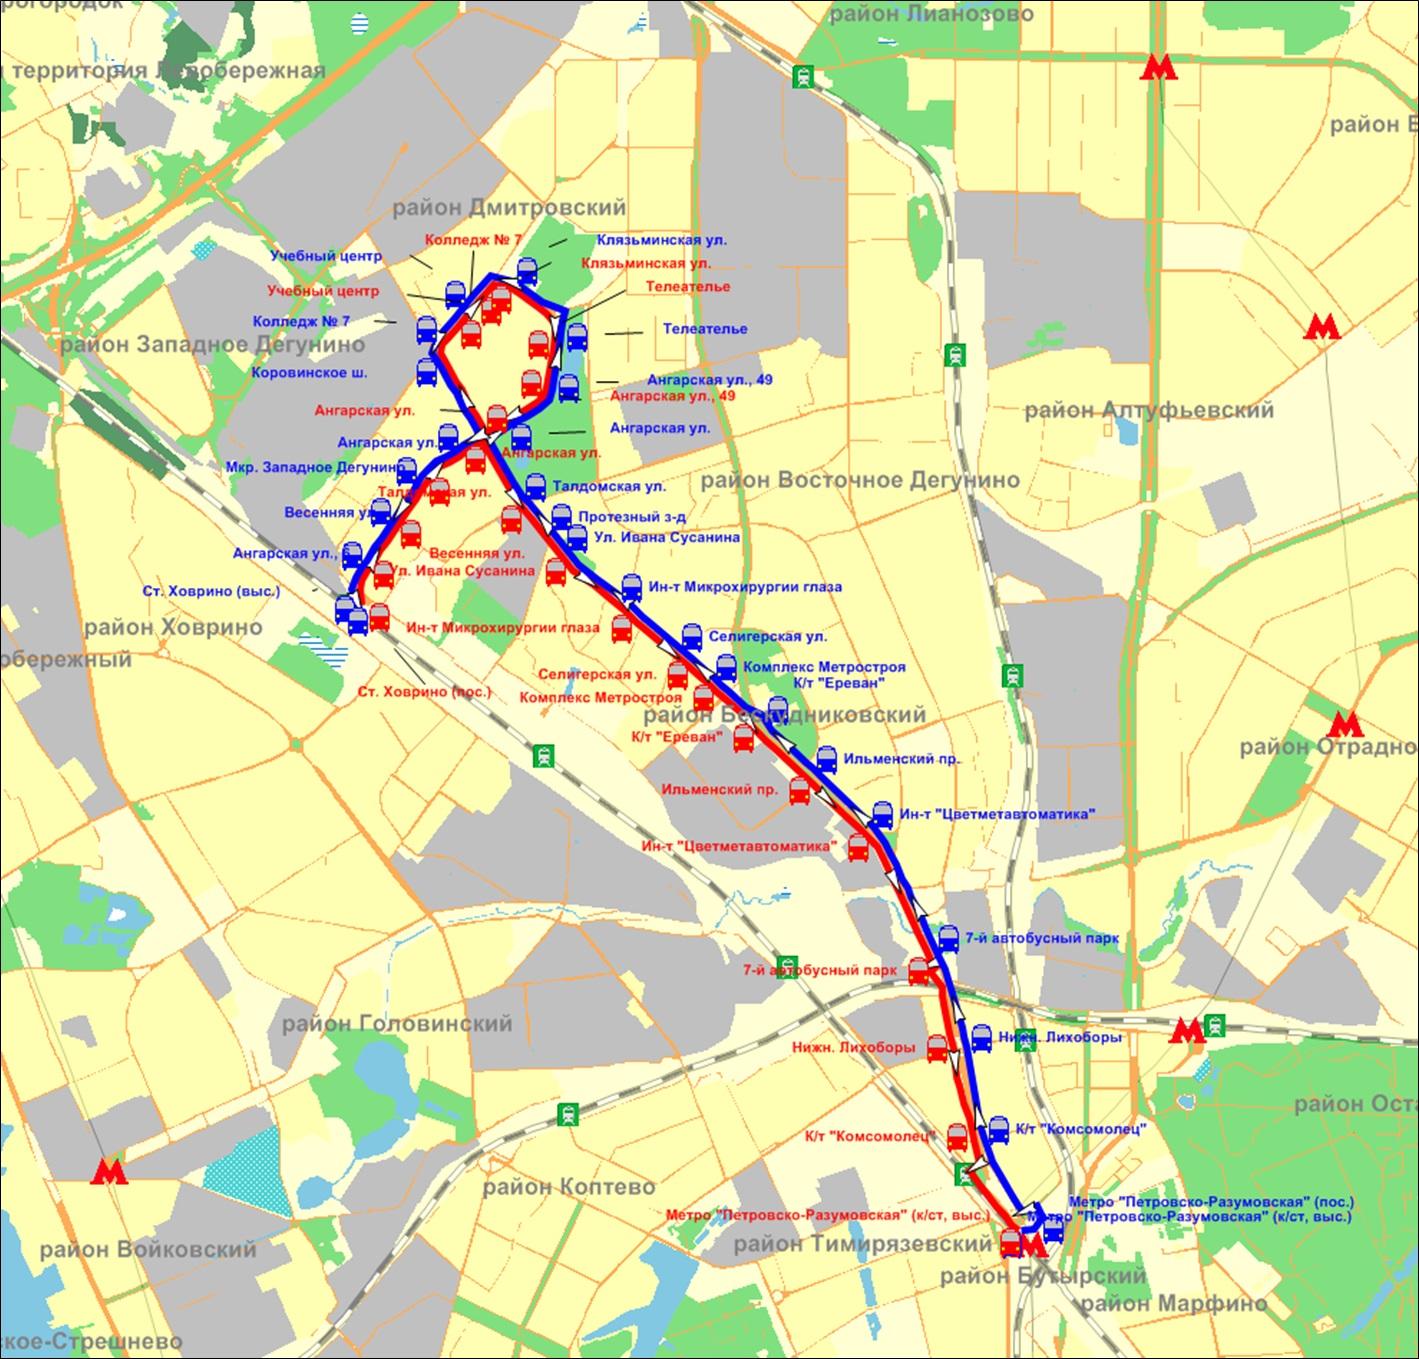 вокзалы метро схема